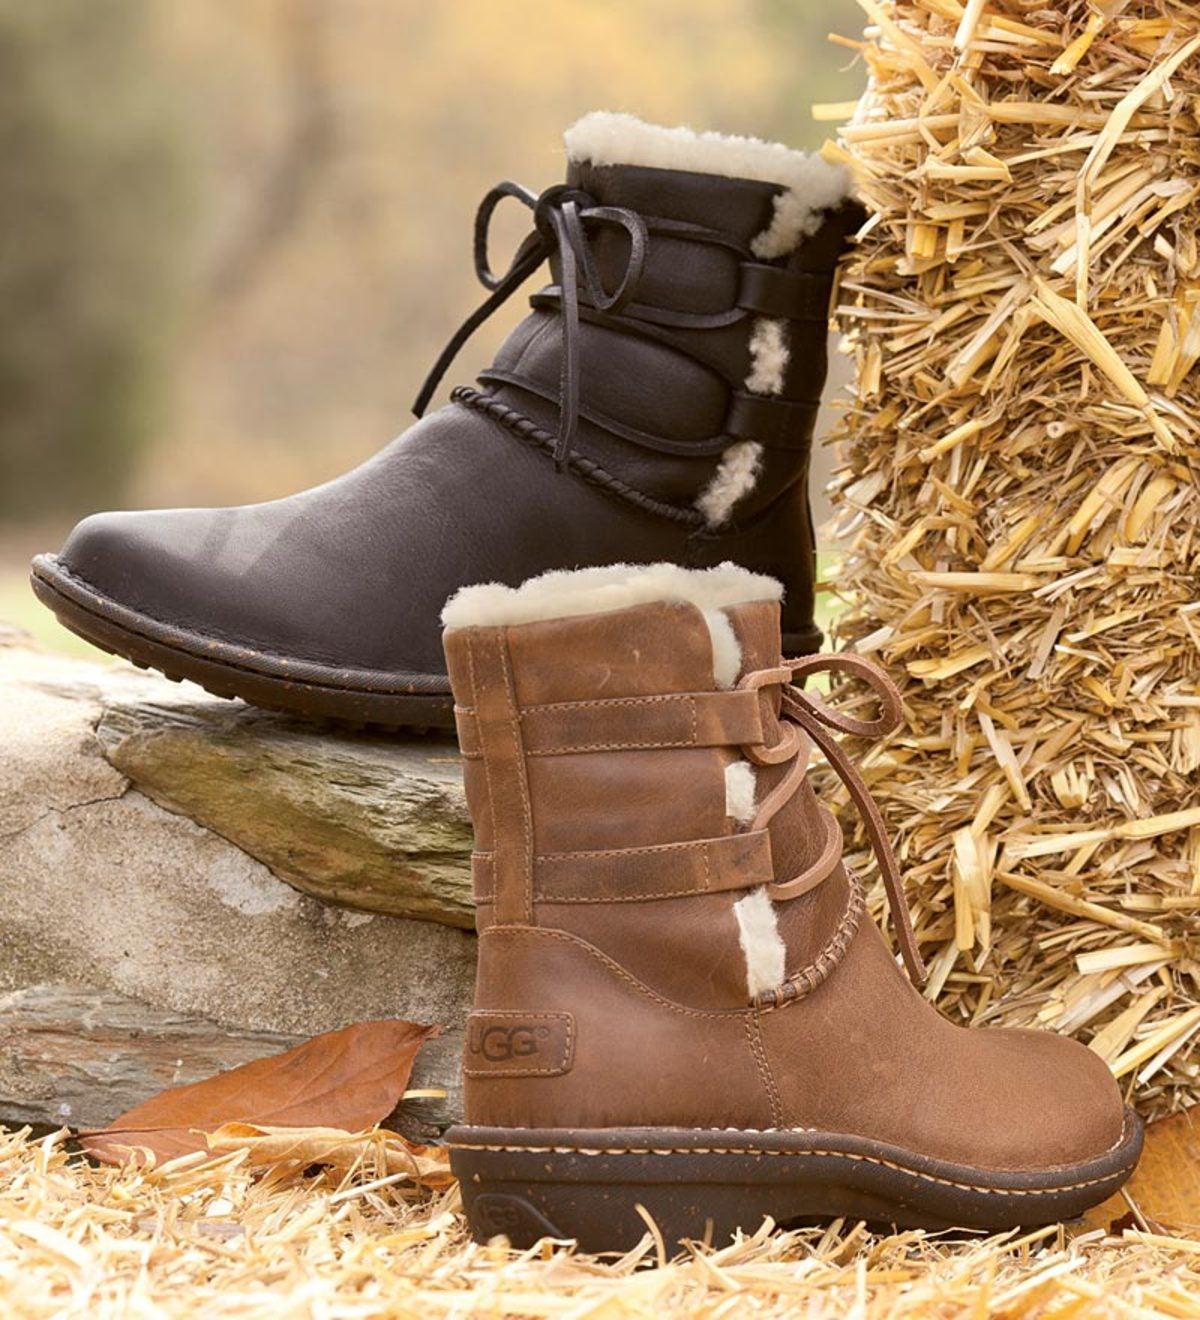 Ugg 174 Australia Women S Caspia Ankle Boots Plowhearth